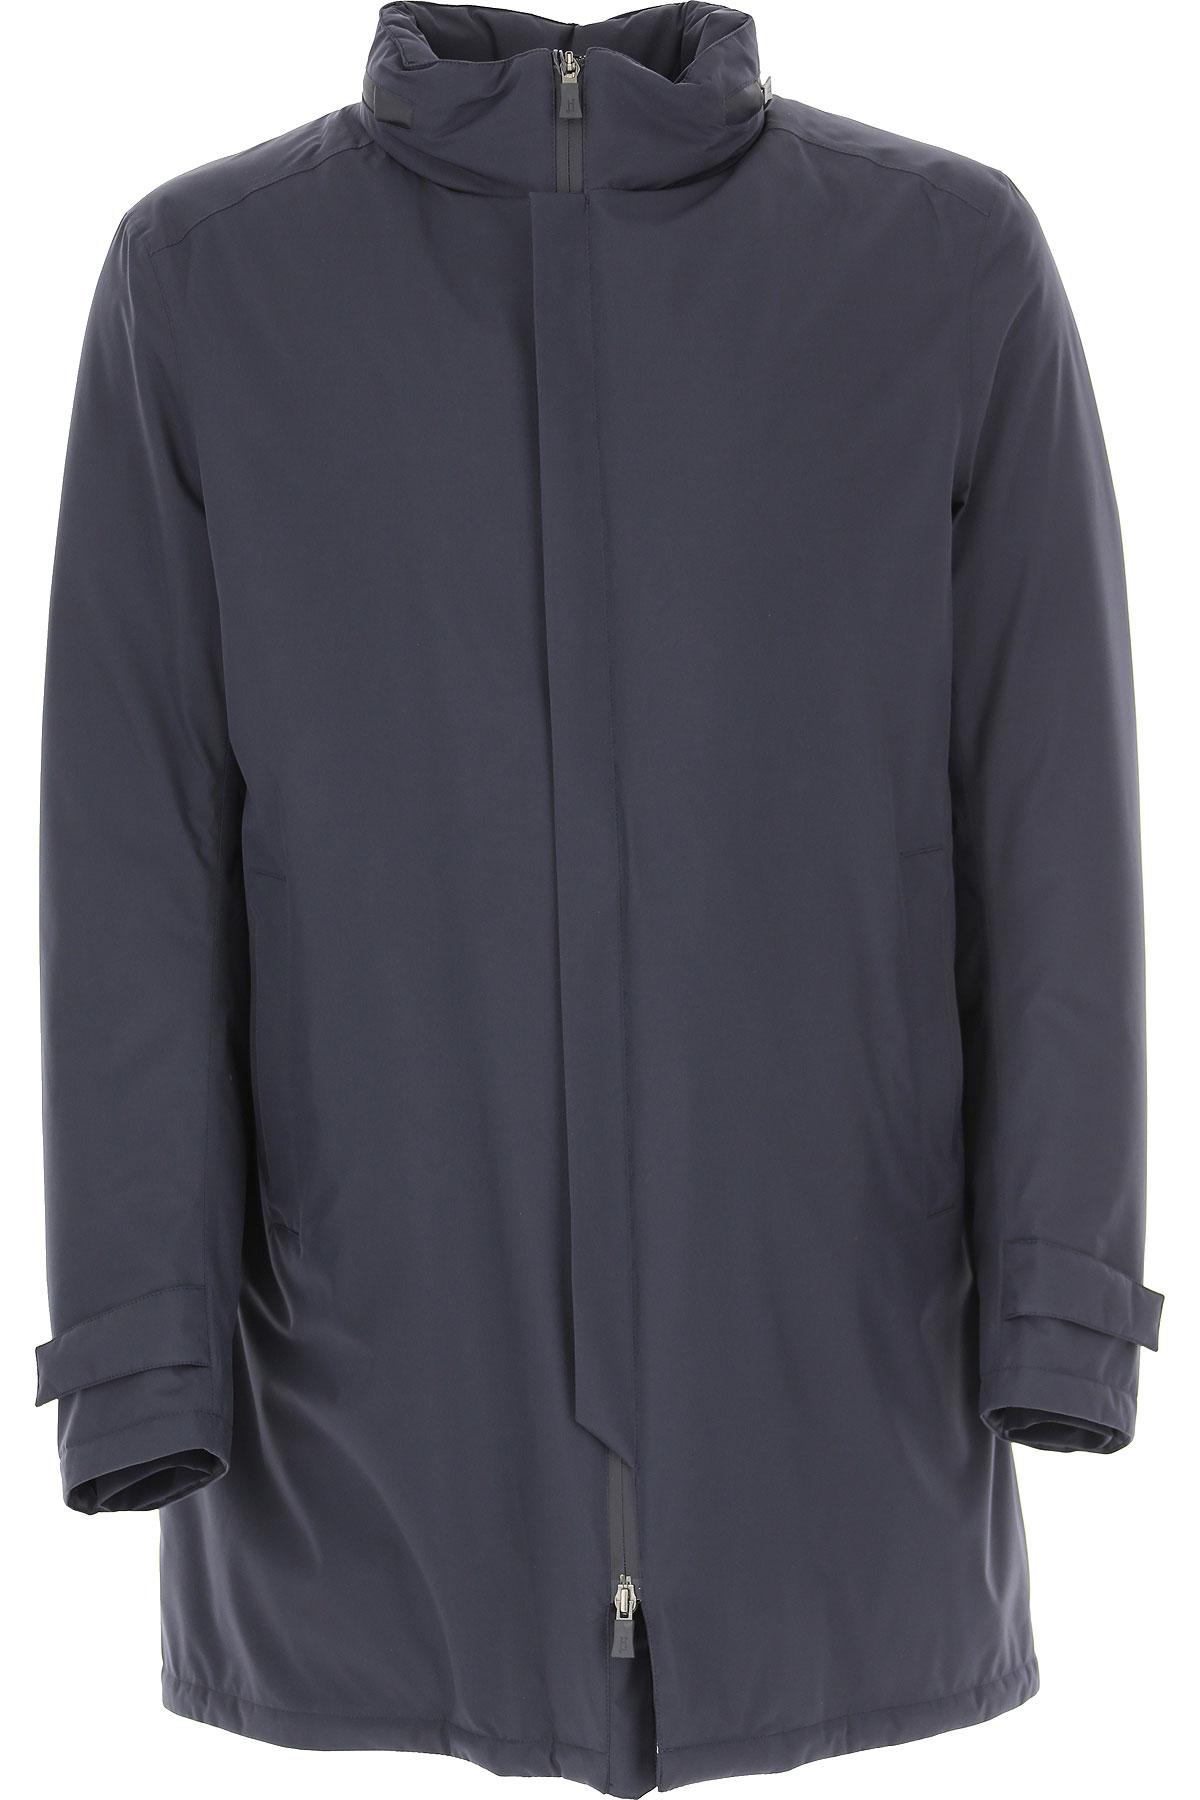 Herno Down Jacket for Men, Puffer Ski Jacket On Sale, Navy Blue, polyestere, 2019, L M XL